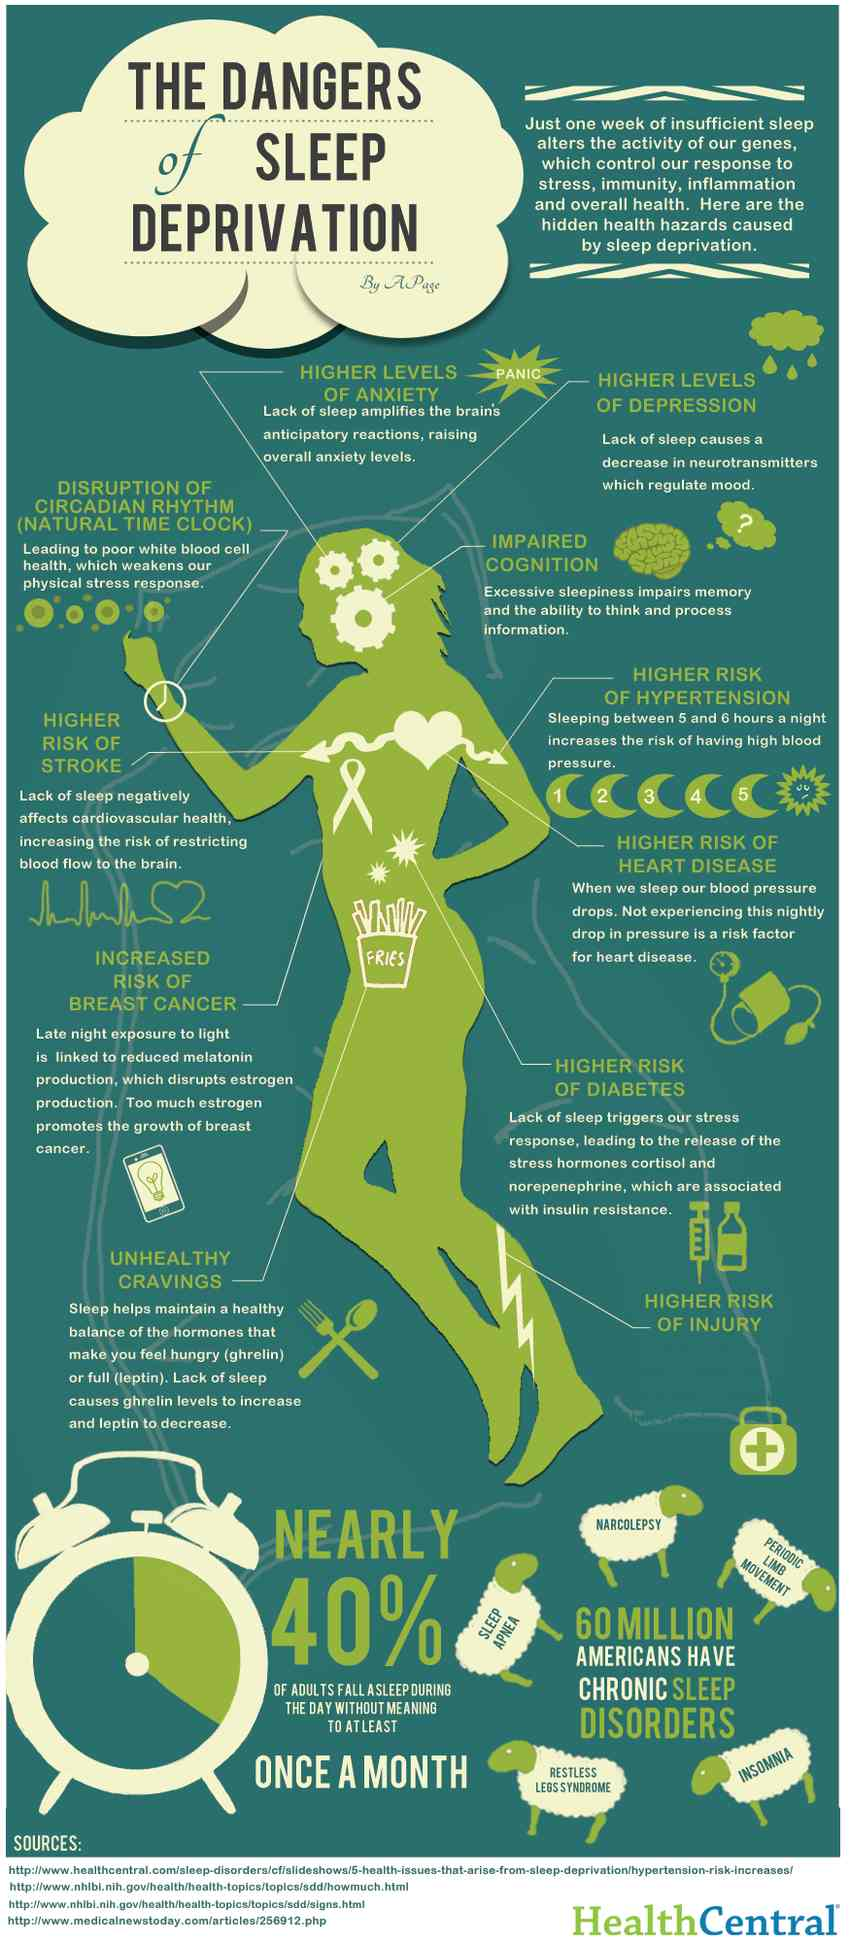 23 Dangers of Sleep Deprivation (Infographic)